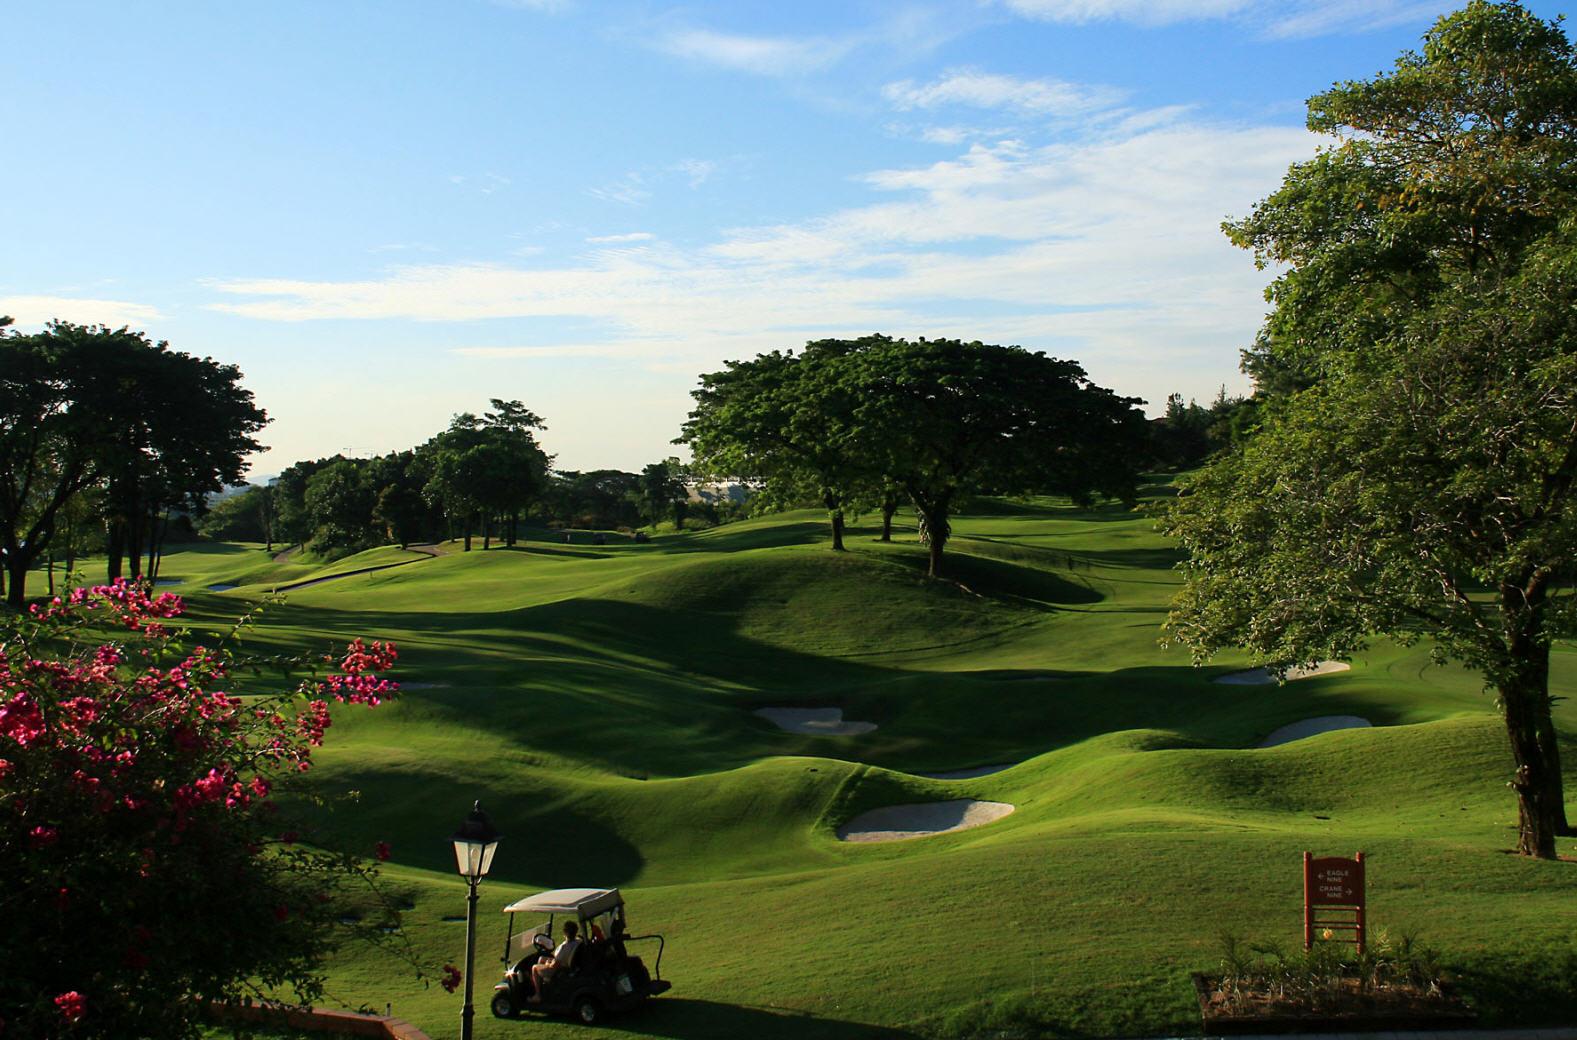 IAGTO Asia Mines Golf Club